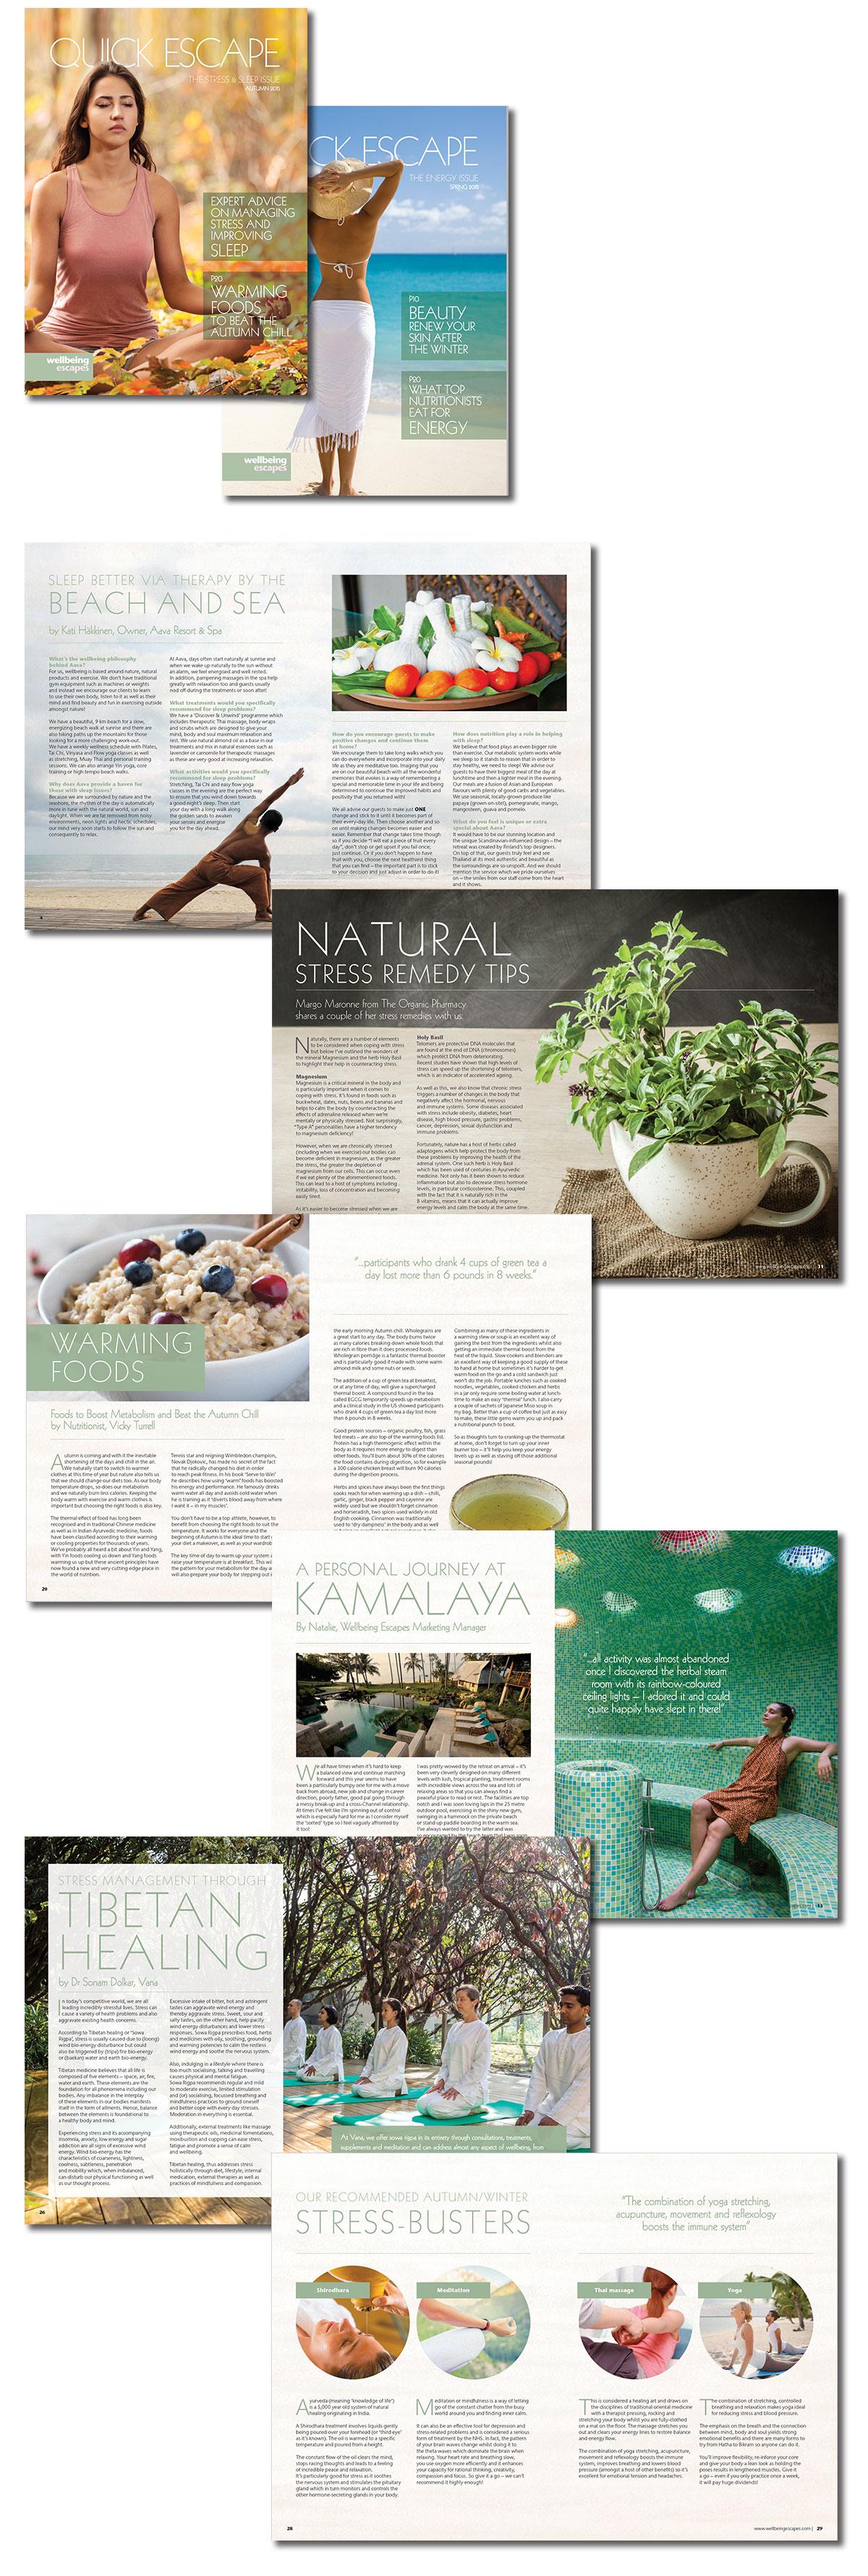 WellbeingMagazine